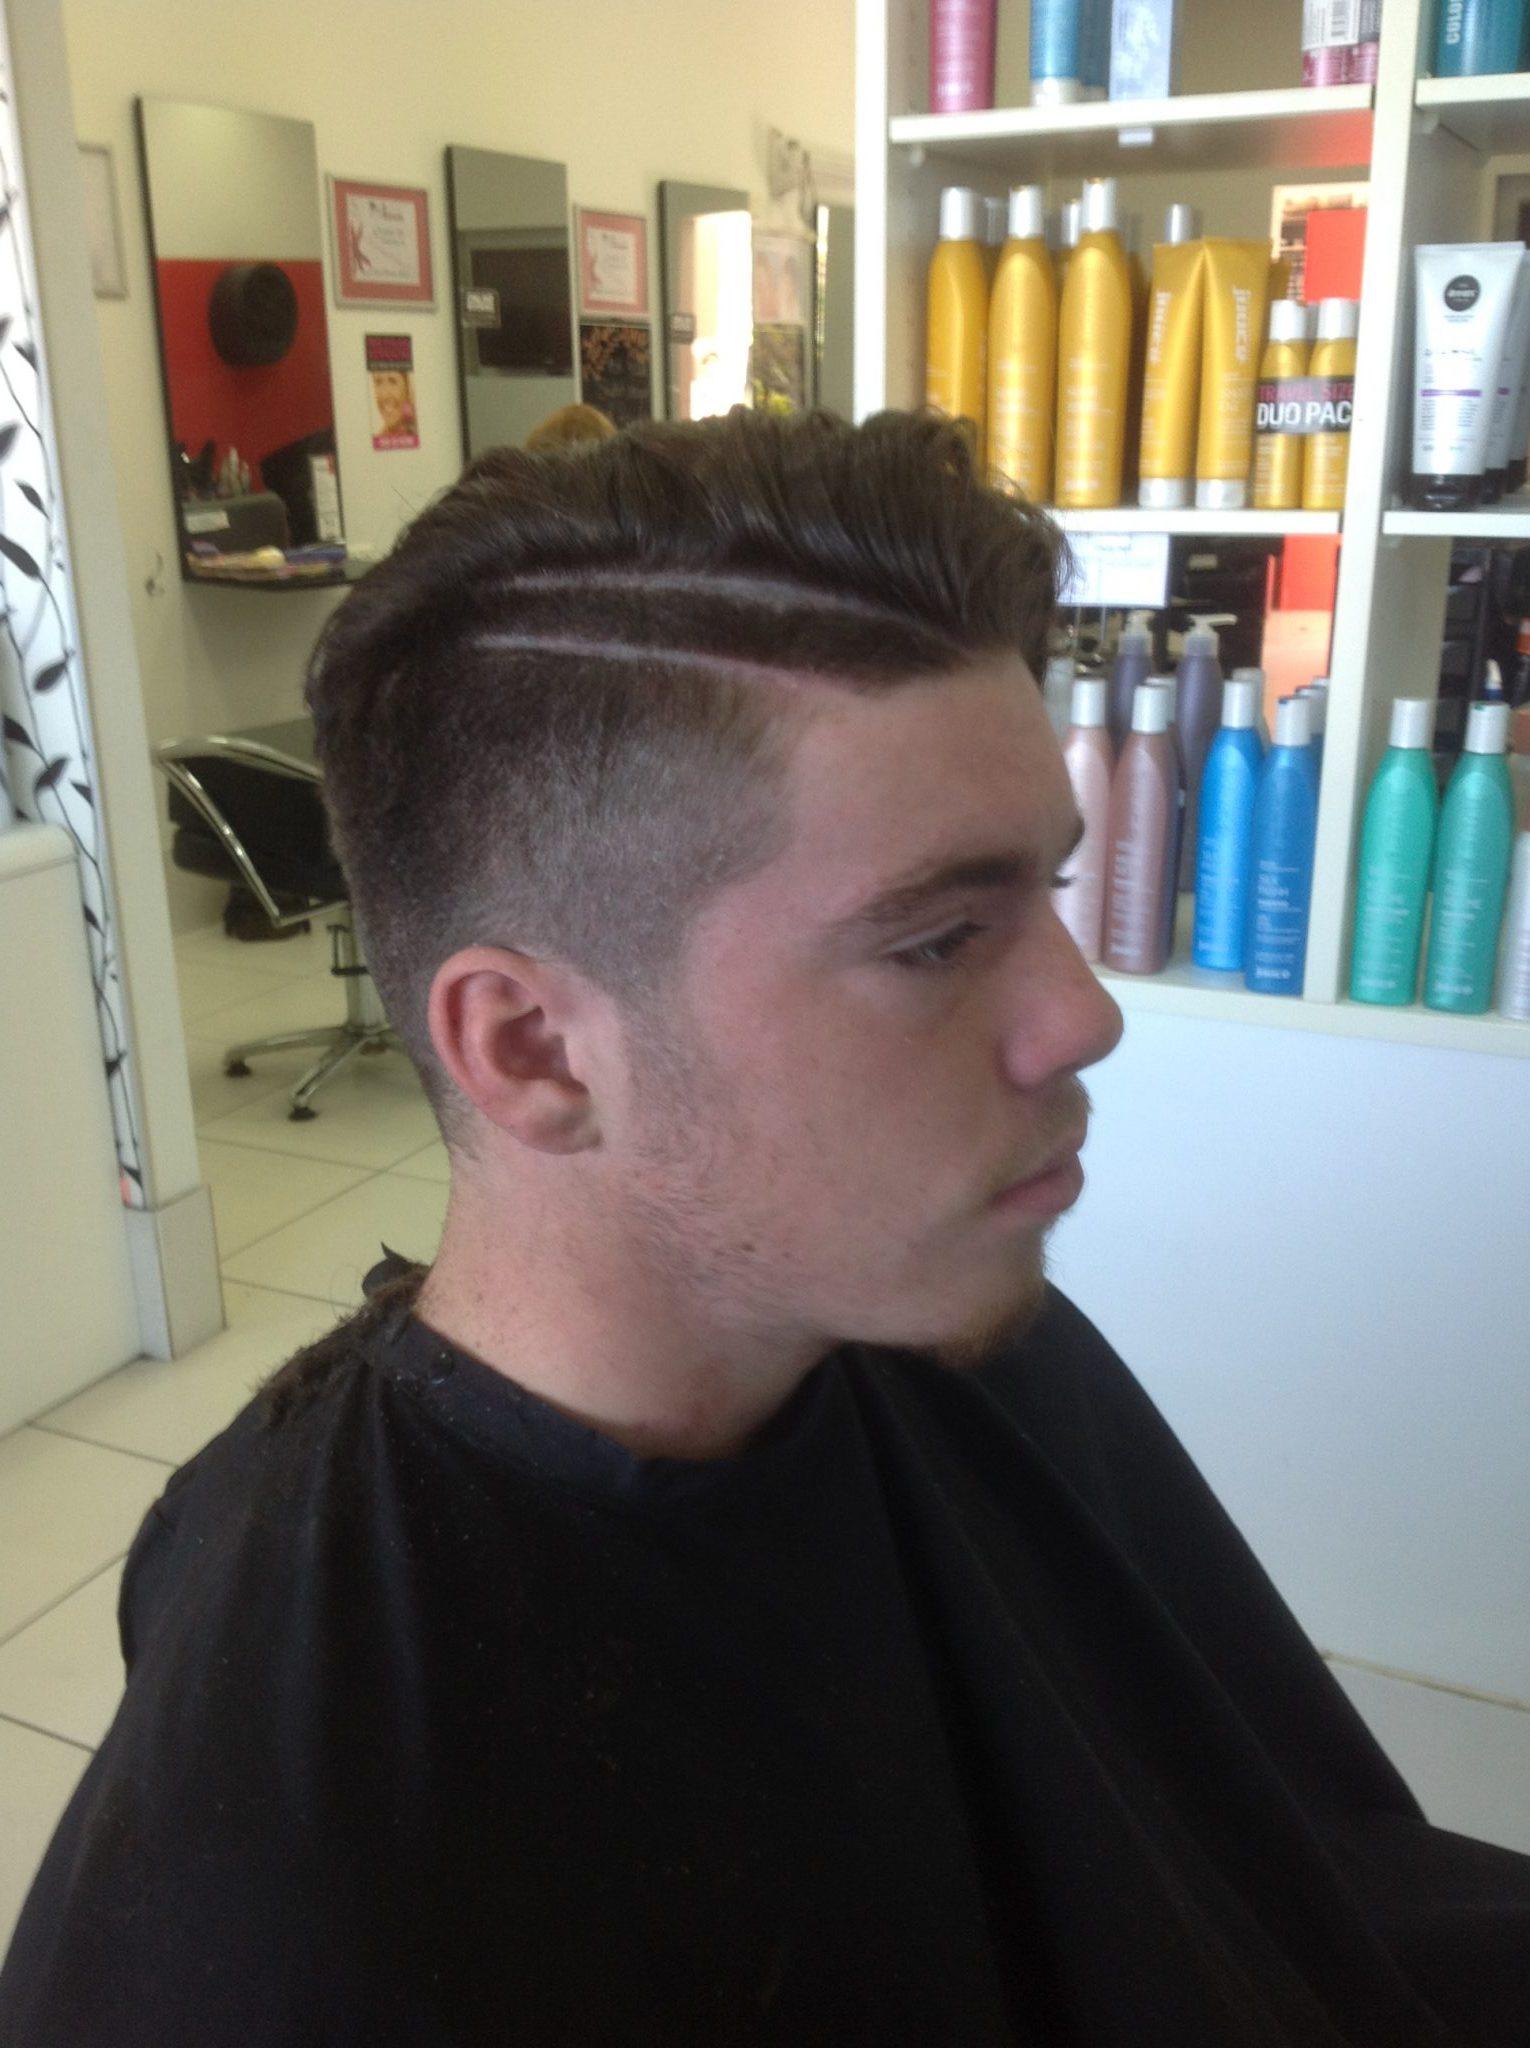 Gallery Of Hair Styles And Designs Keturah Hair Design